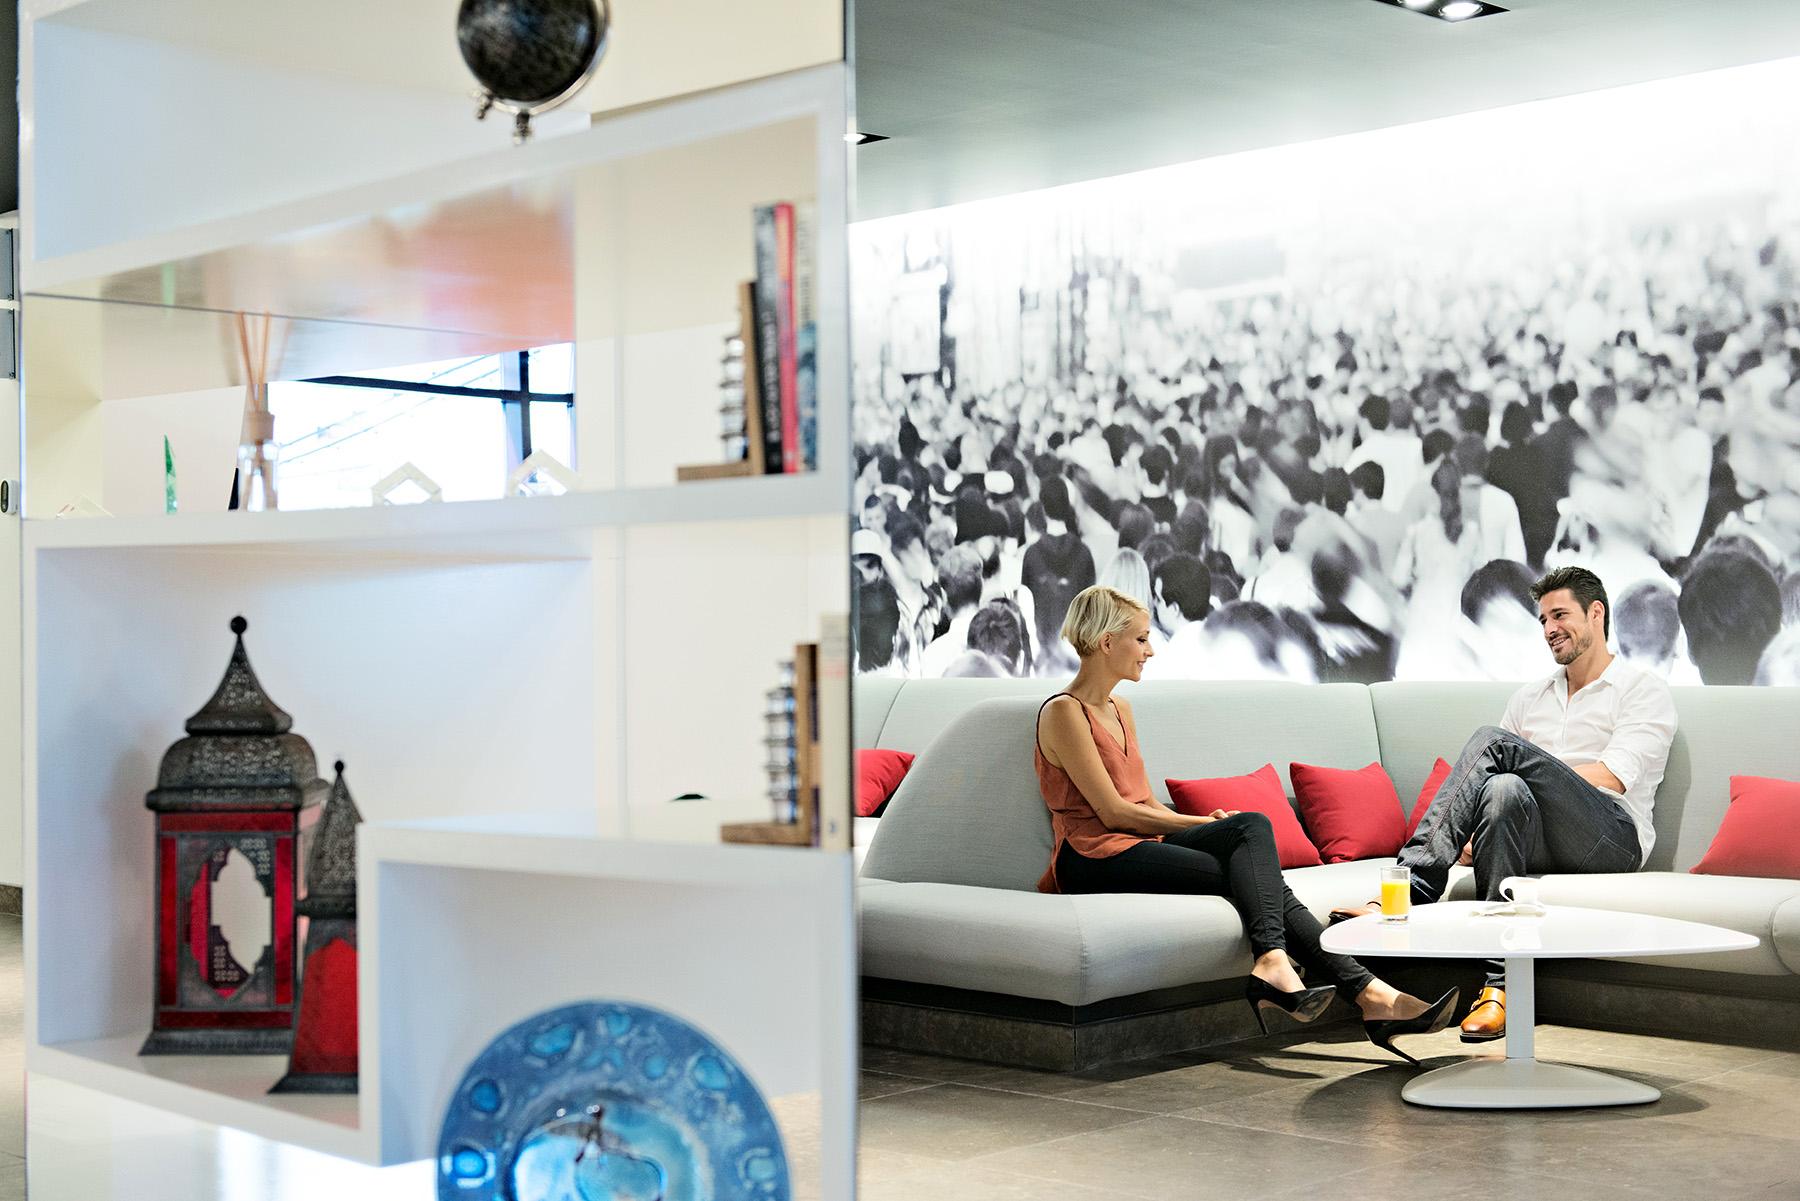 interiors-hospitality-lifestyle-novotel-hotel-montreal-004